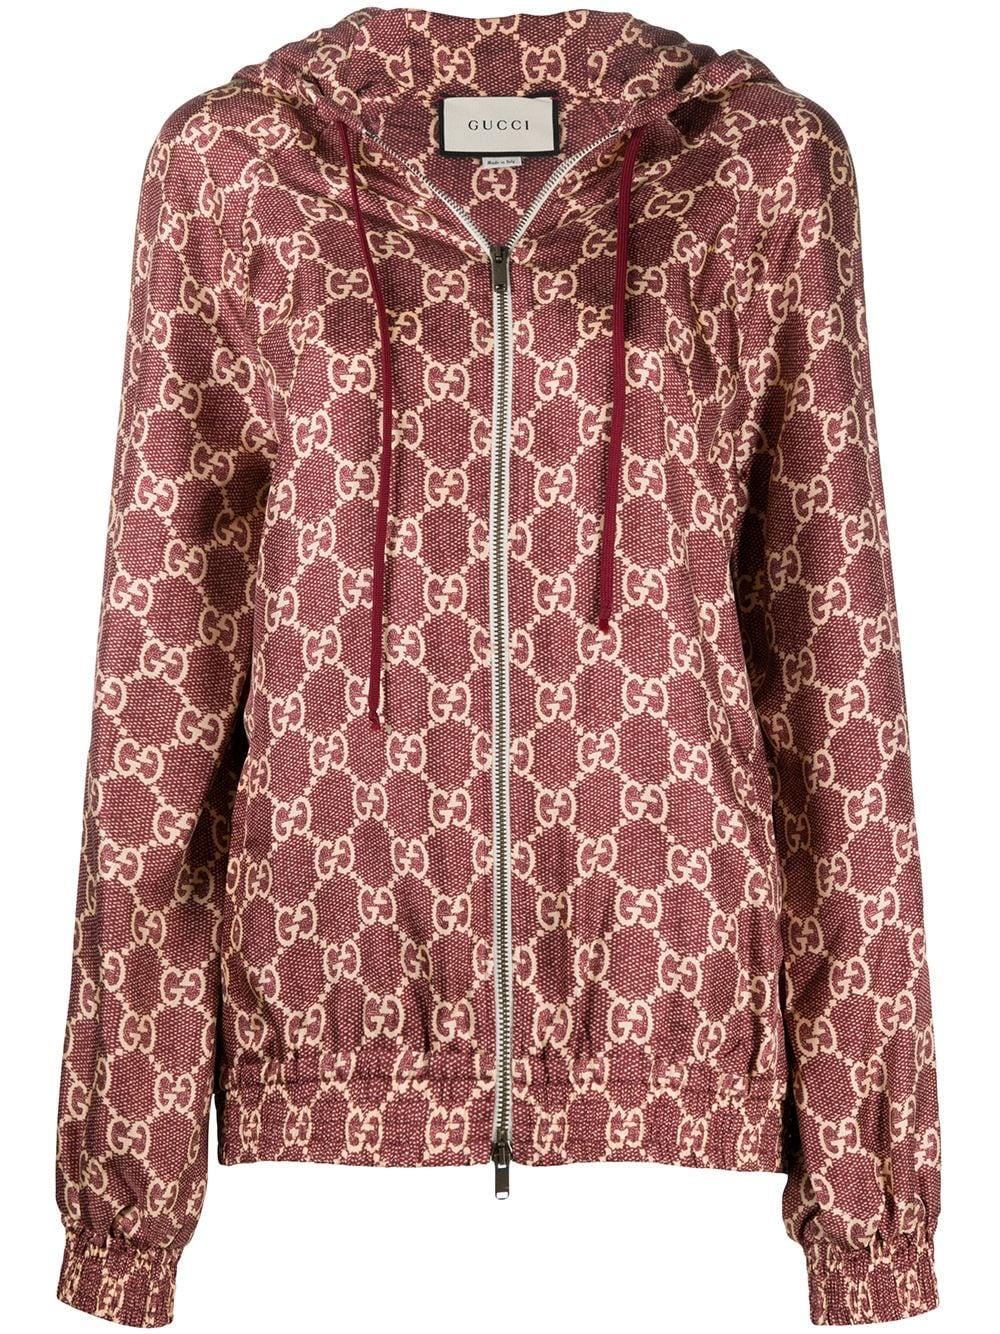 Gg Supreme Silk Blend Jacket